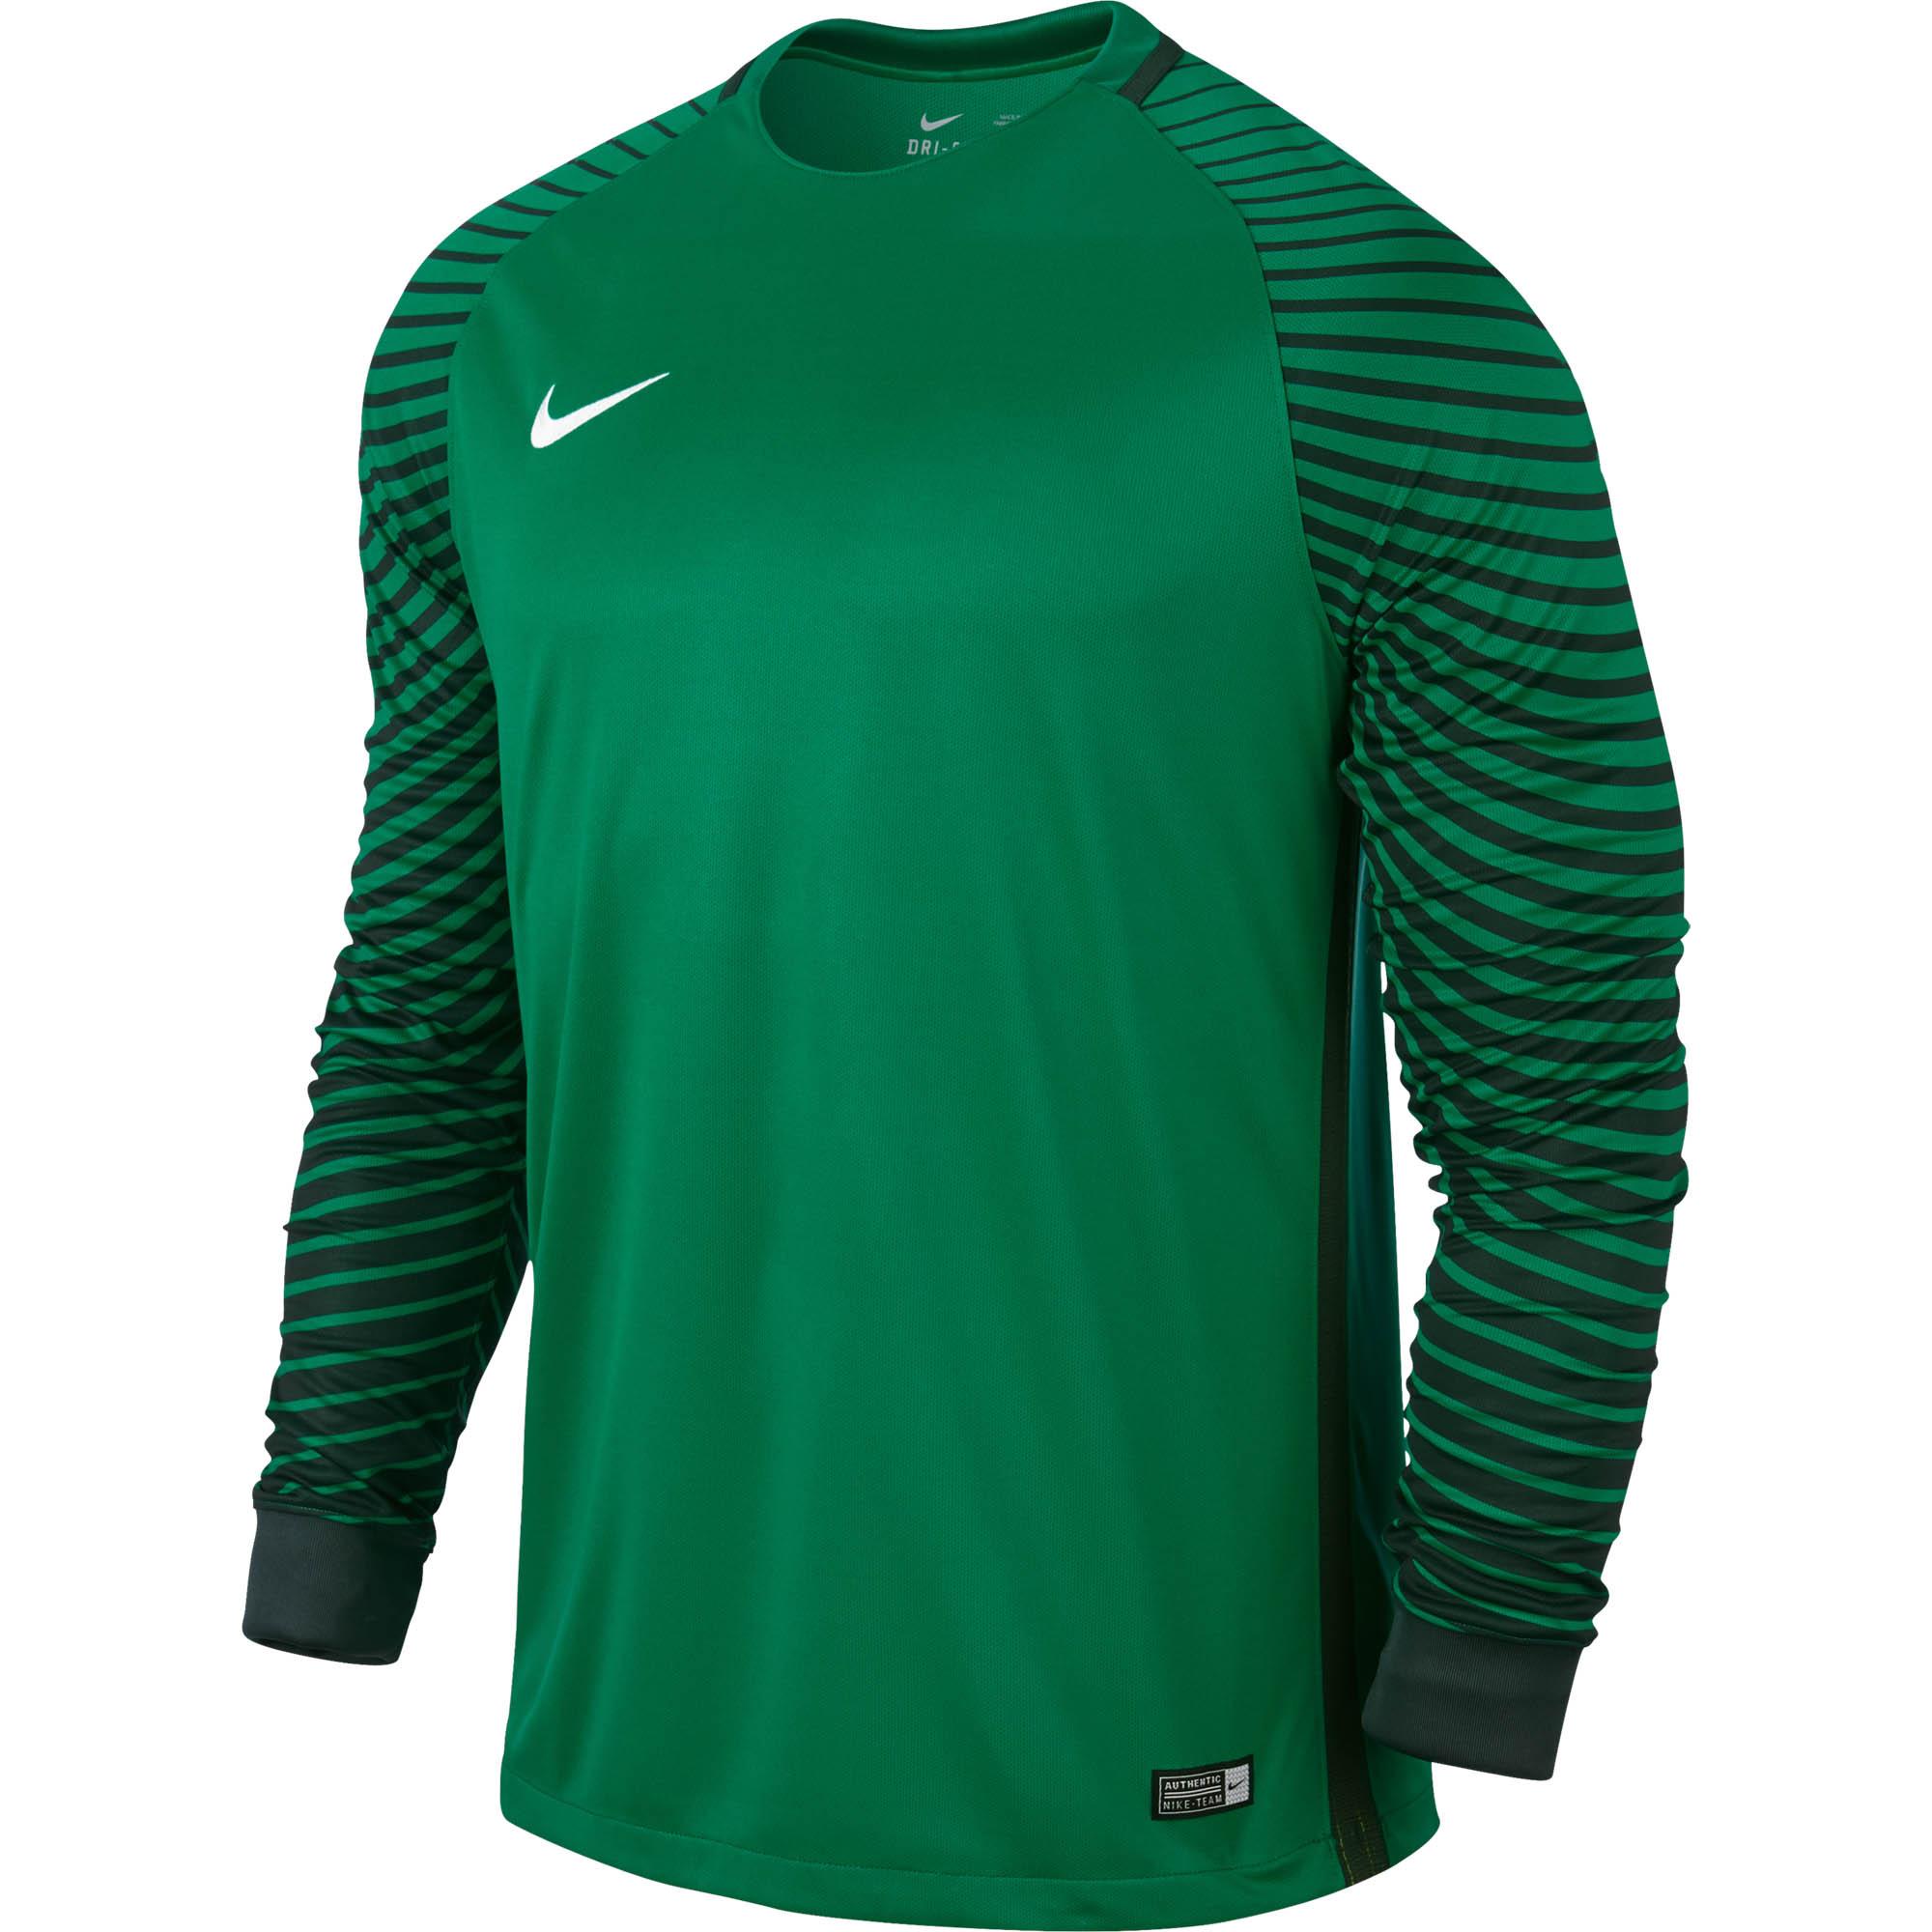 c53c26d85f1 Nike Gardien Goalkeeper Jersey – Lucid Green Grove Green